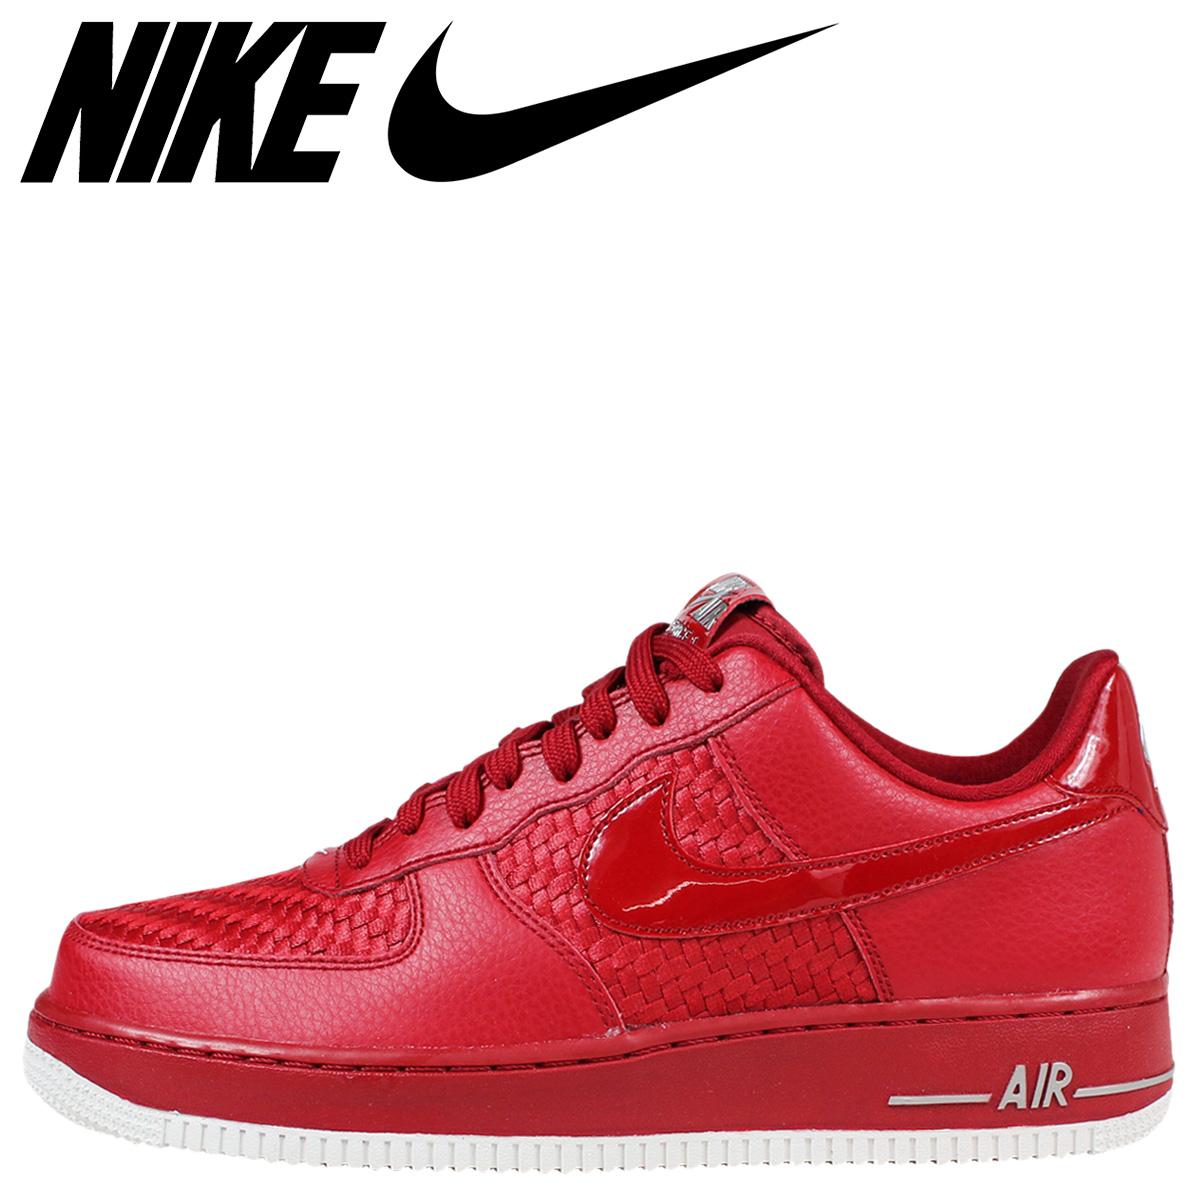 b72e0690e157 SneaK Online Shop  Nike NIKE air force 1 sneakers AIR FORCE 1 07 LV8 ...